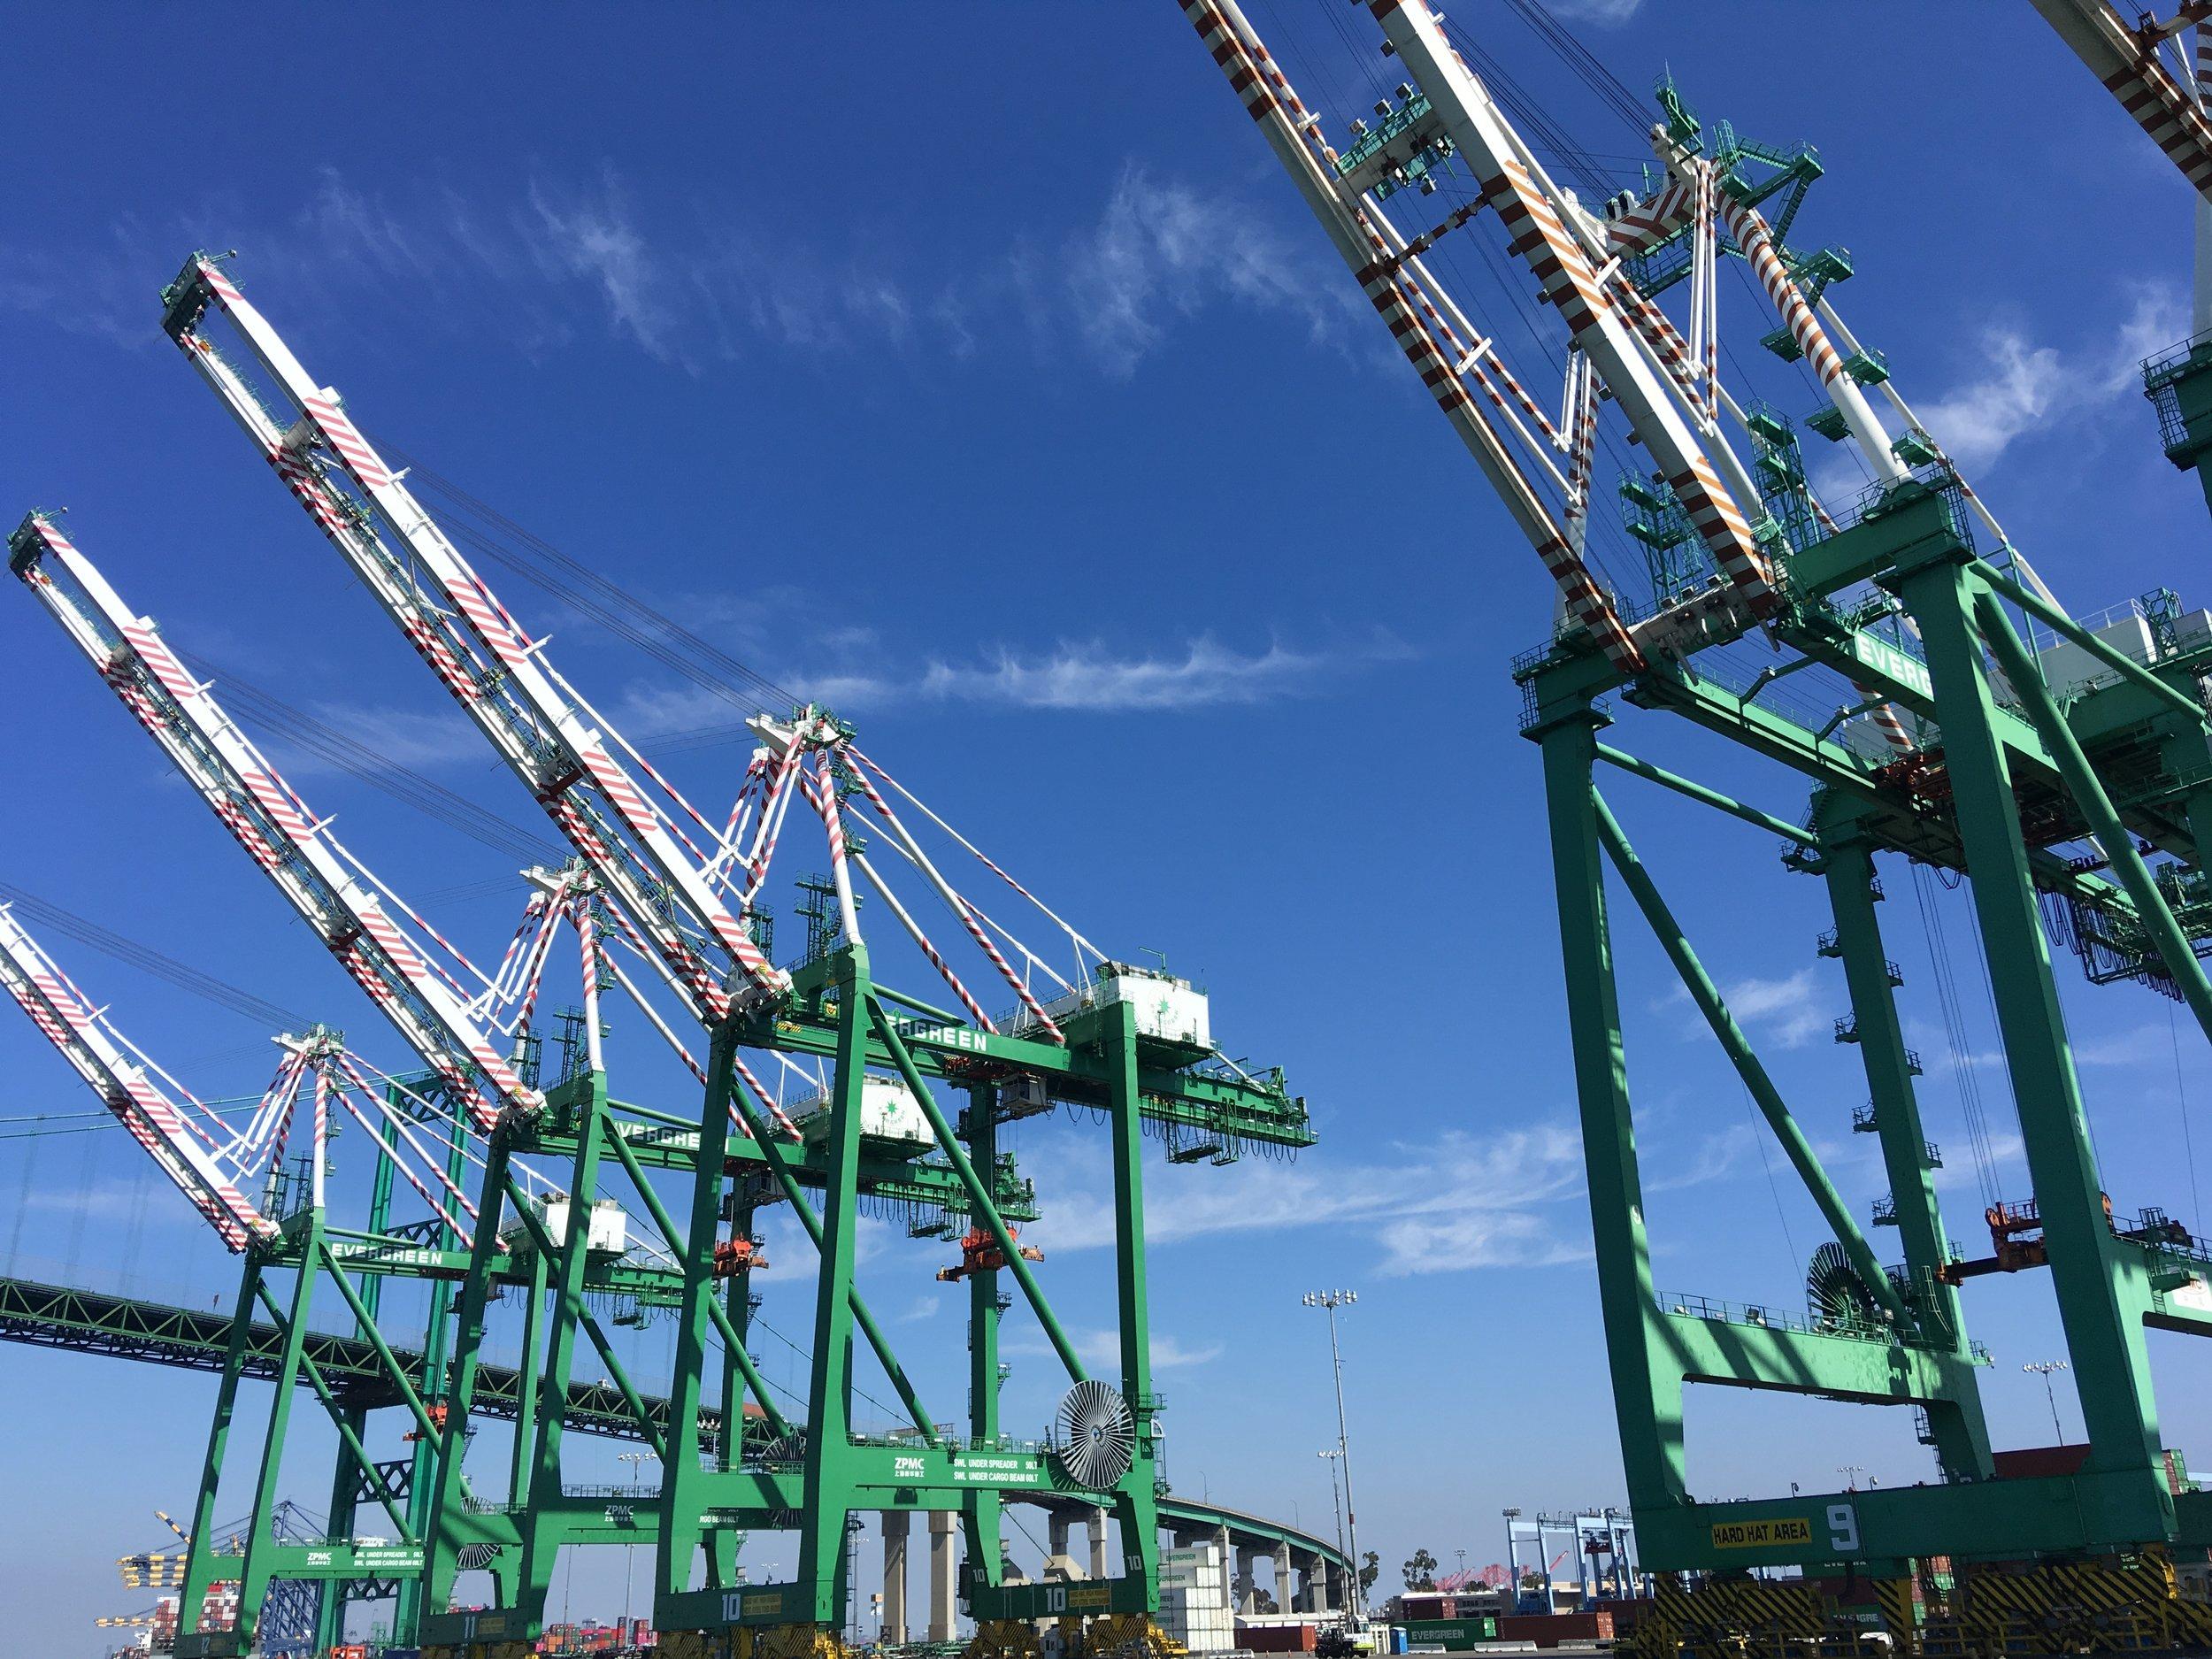 October 5, 2018: Field Lab Visit to Port of LA